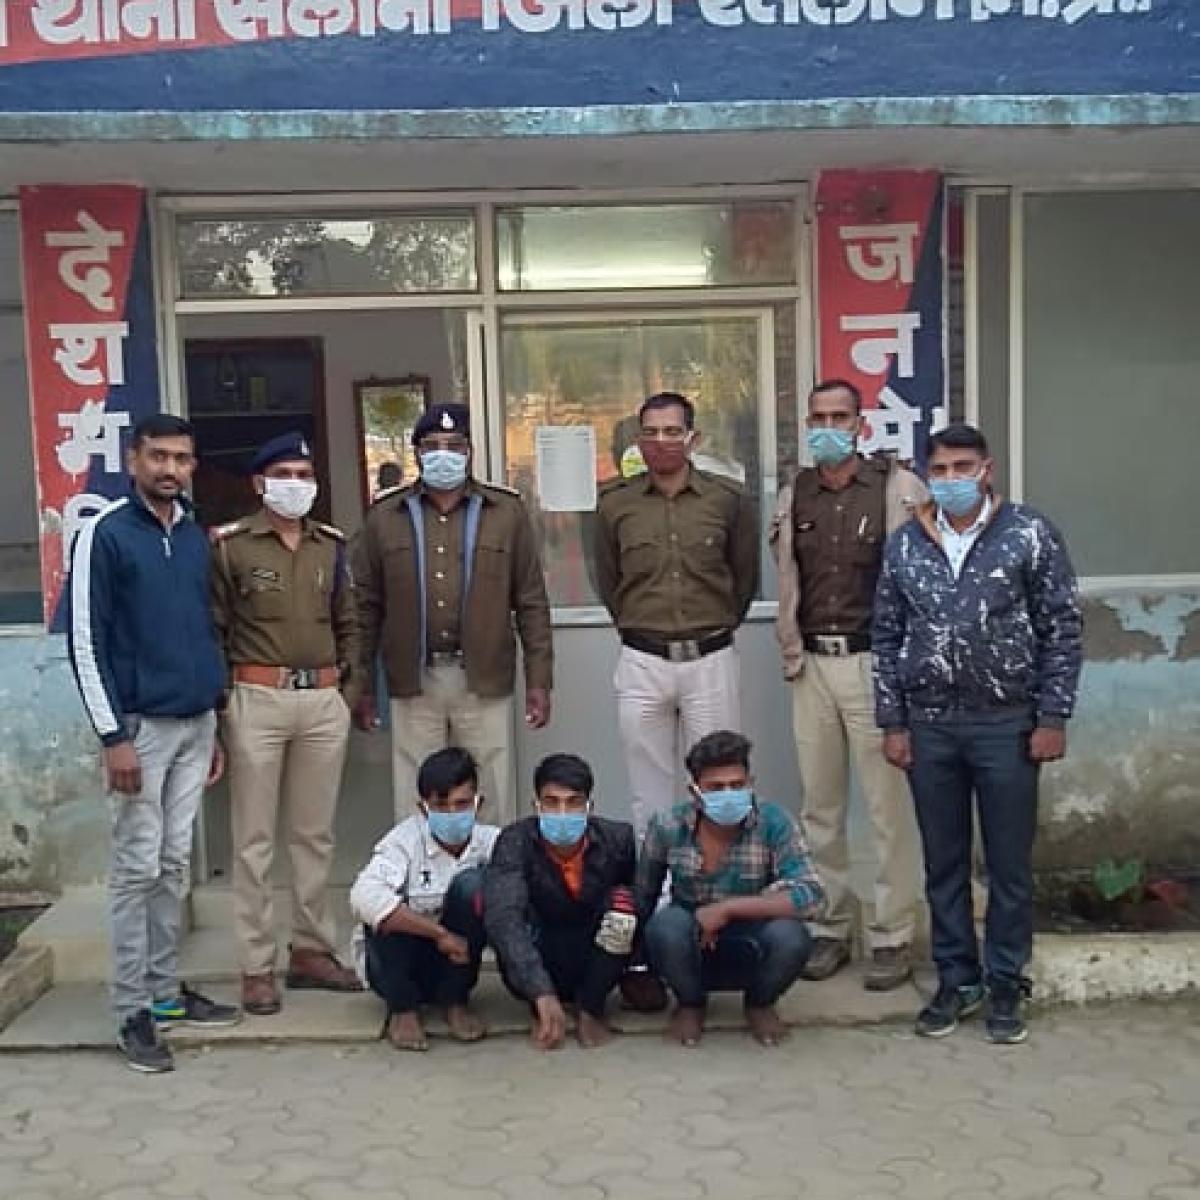 Madhya Pradesh: 3 held for theft at Dr Deepak Joshi's residence in Sailana